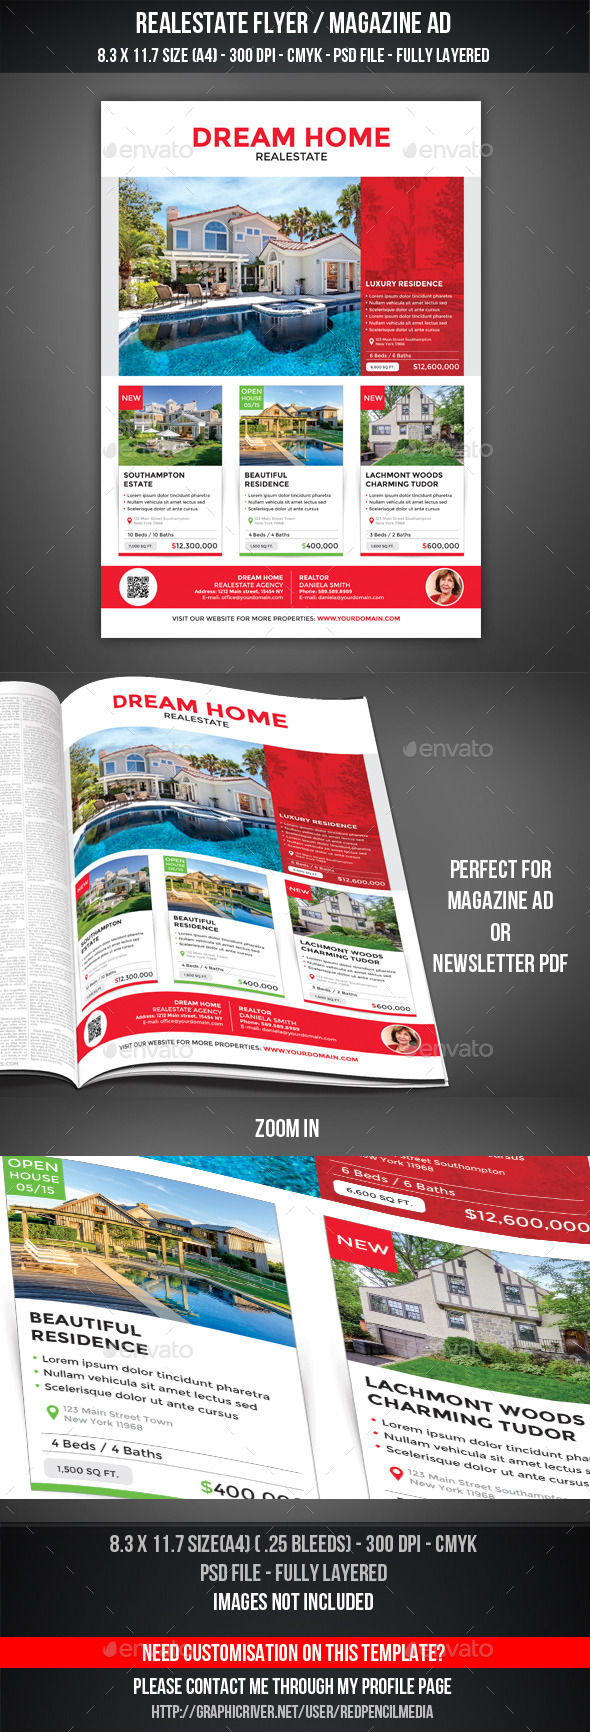 Realestate Flyer / Magazine AD - Commerce Flyers